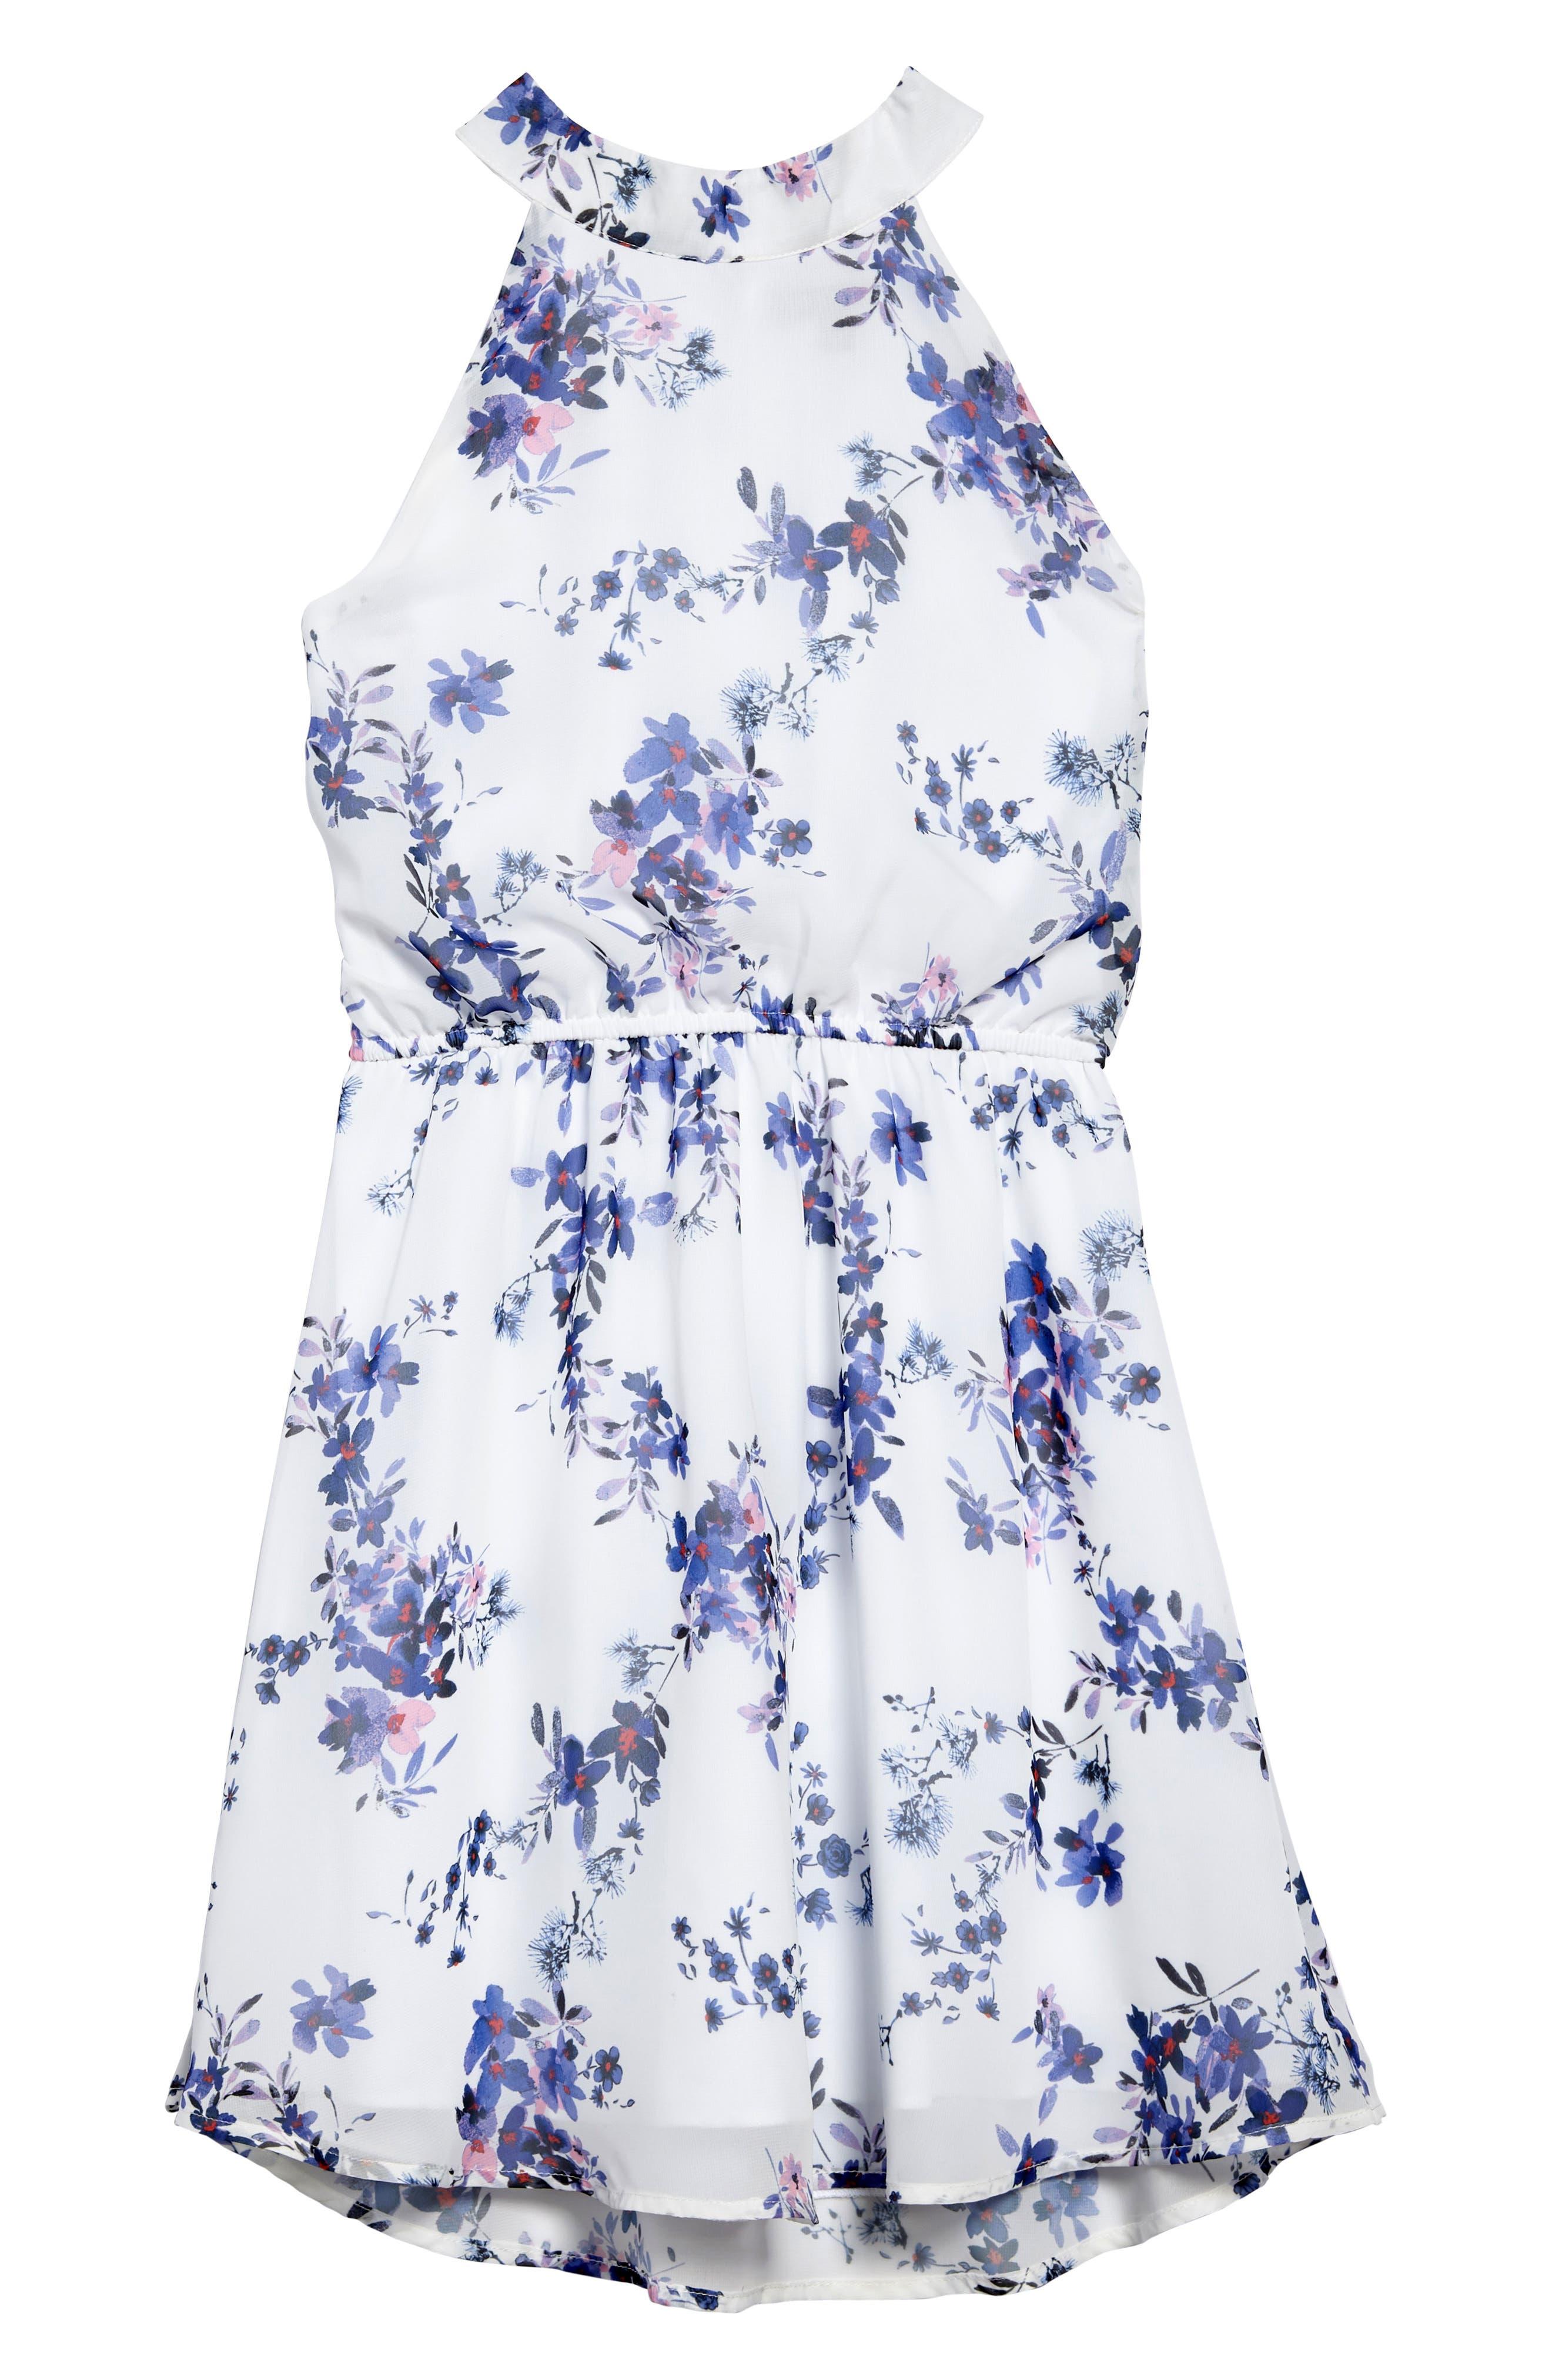 Alternate Image 1 Selected - Ava & Yelly Floral Mock Neck Dress (Big Girls)